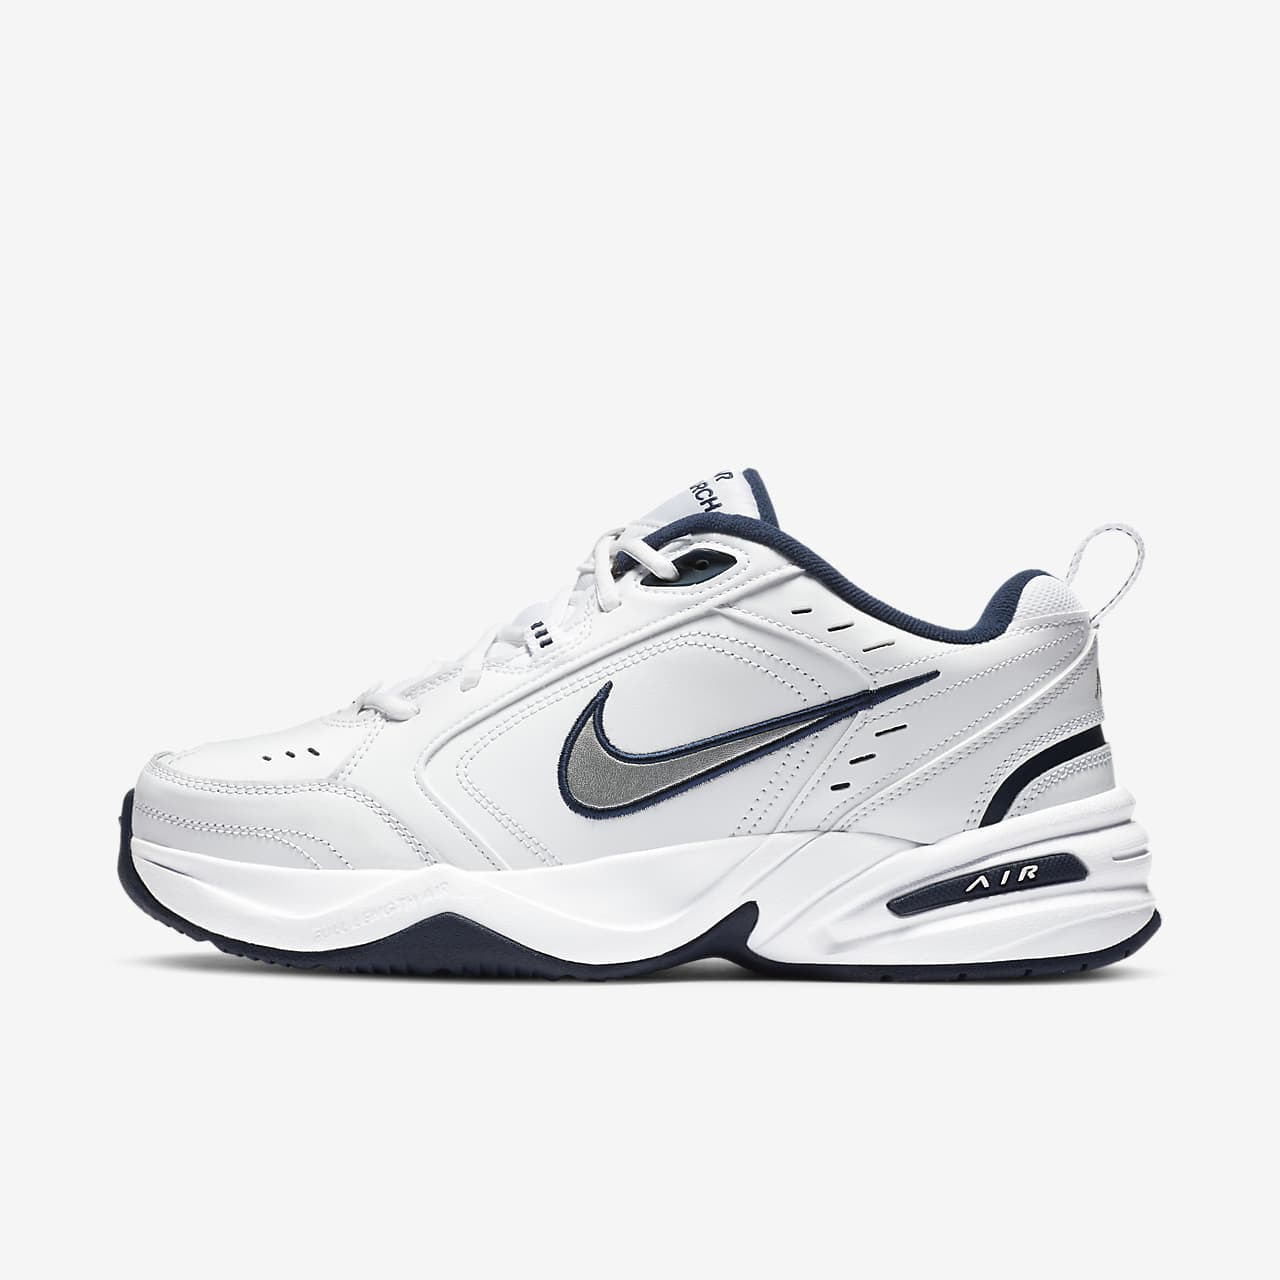 Nike Air Monarch IV 生活風格/健身鞋